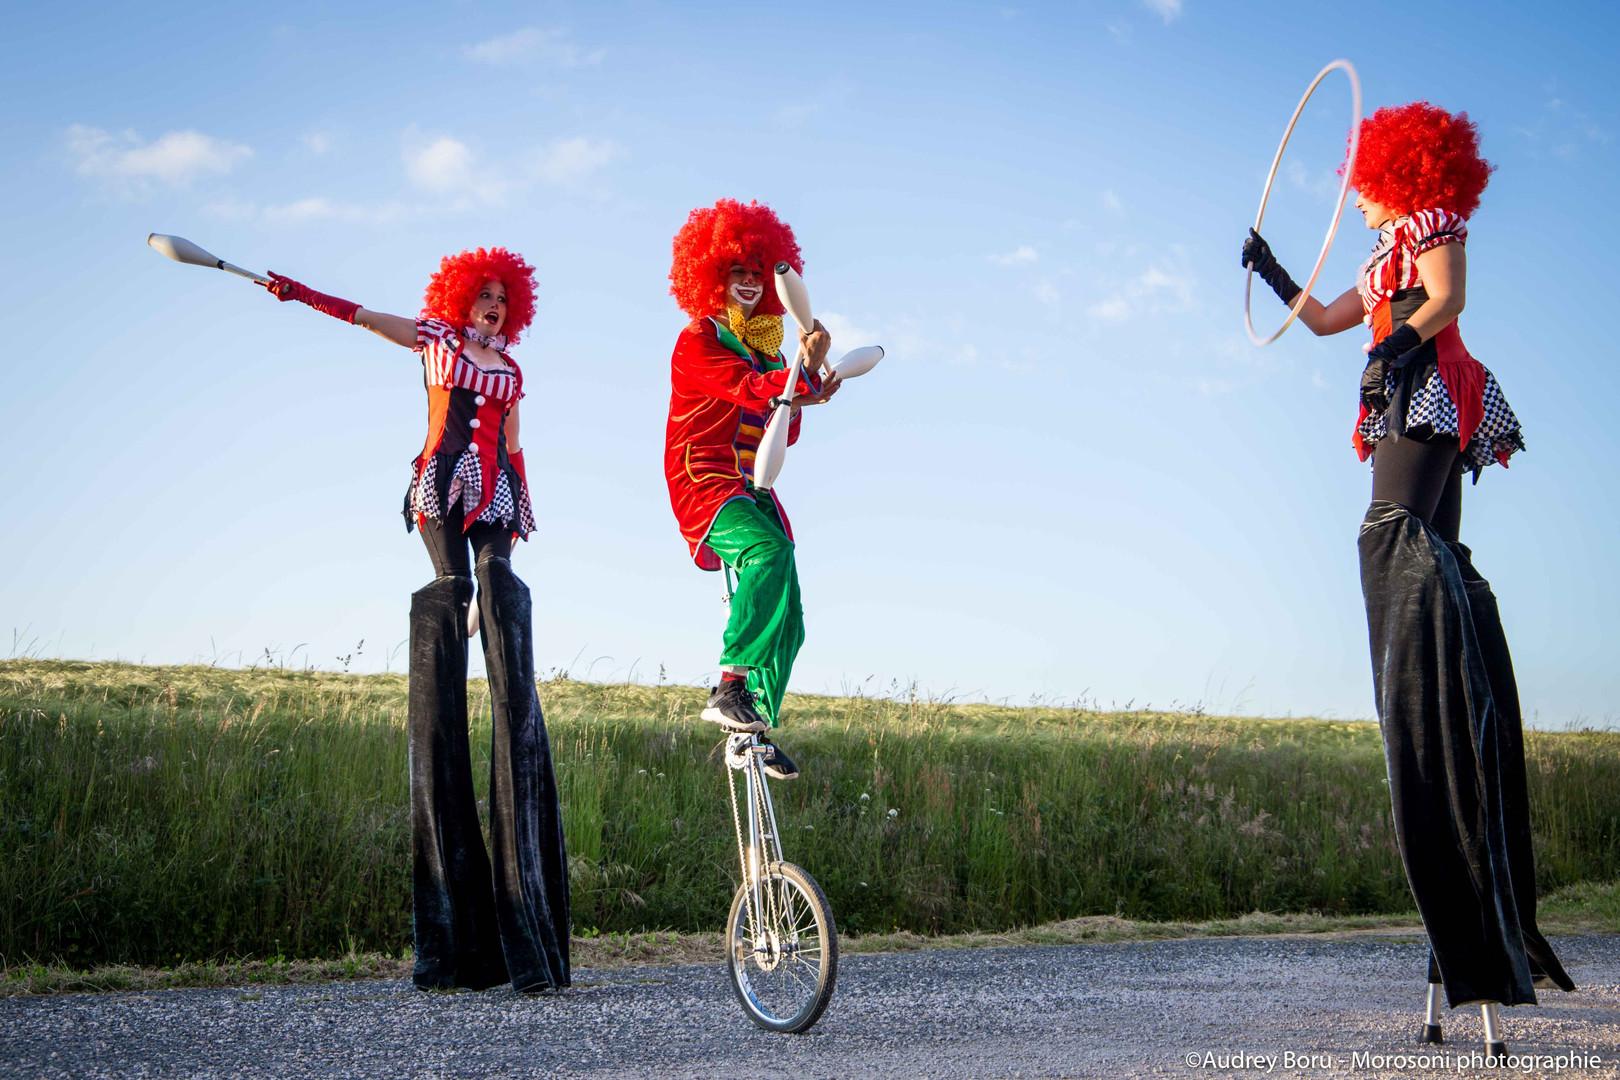 deambulation-clown1-cirkomcha-min.jpg